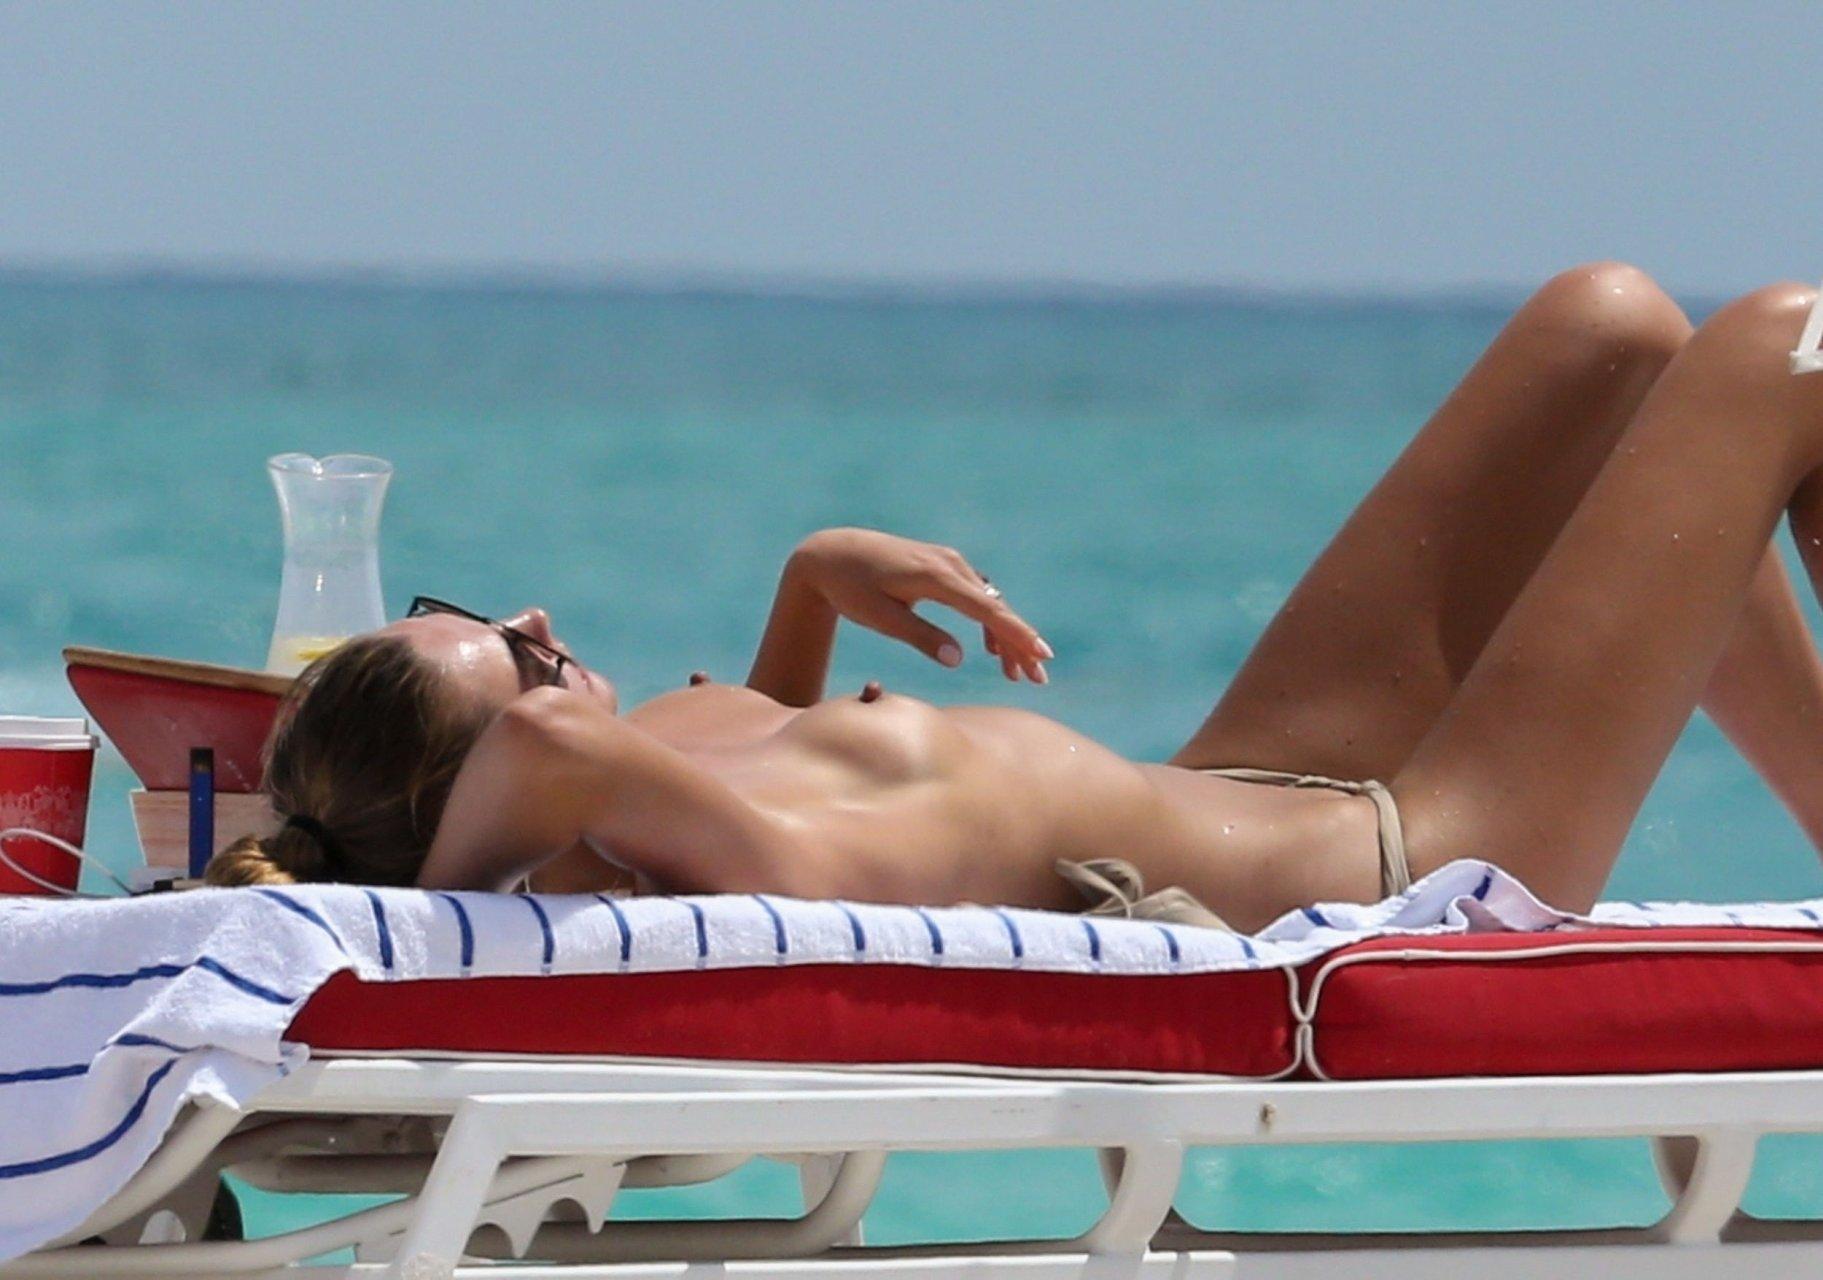 Nude celebrity urszula makowska bikini candids in miami beach